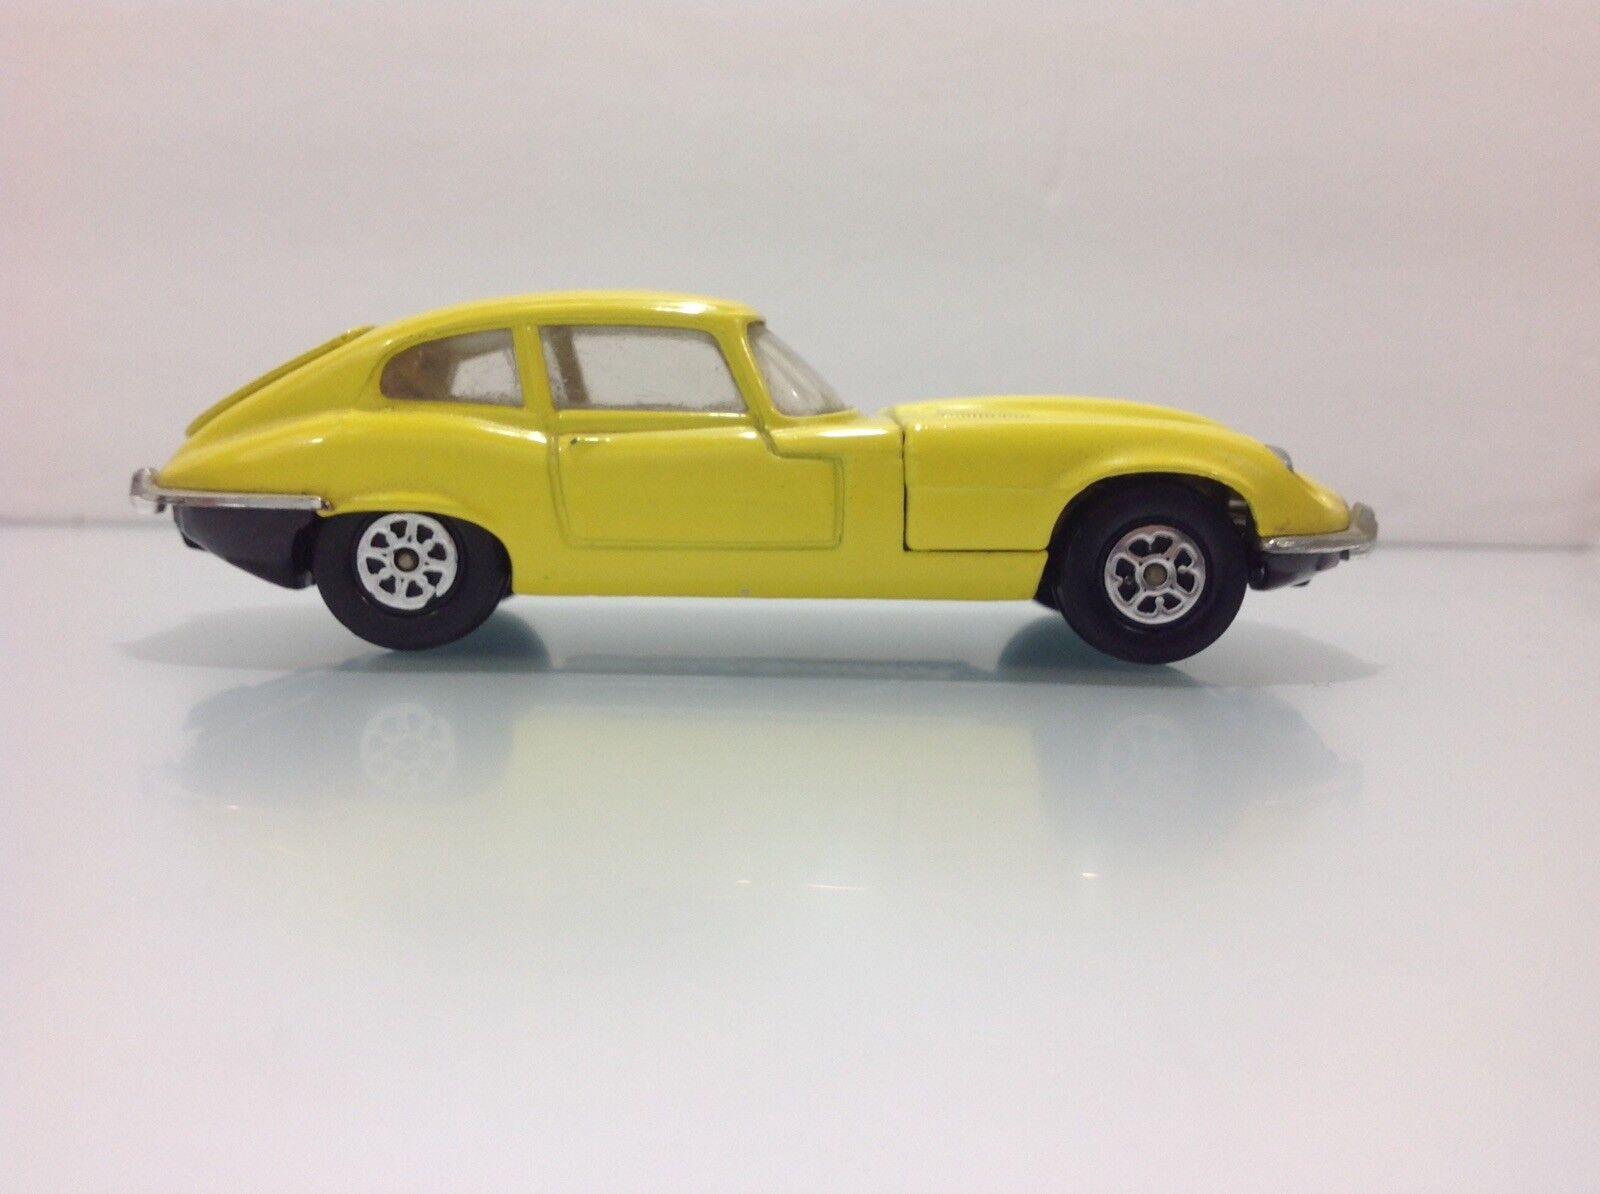 Jaguar e - type 2.2 corgi spielzeug whizzwheels v12 (jahrgang 1973)